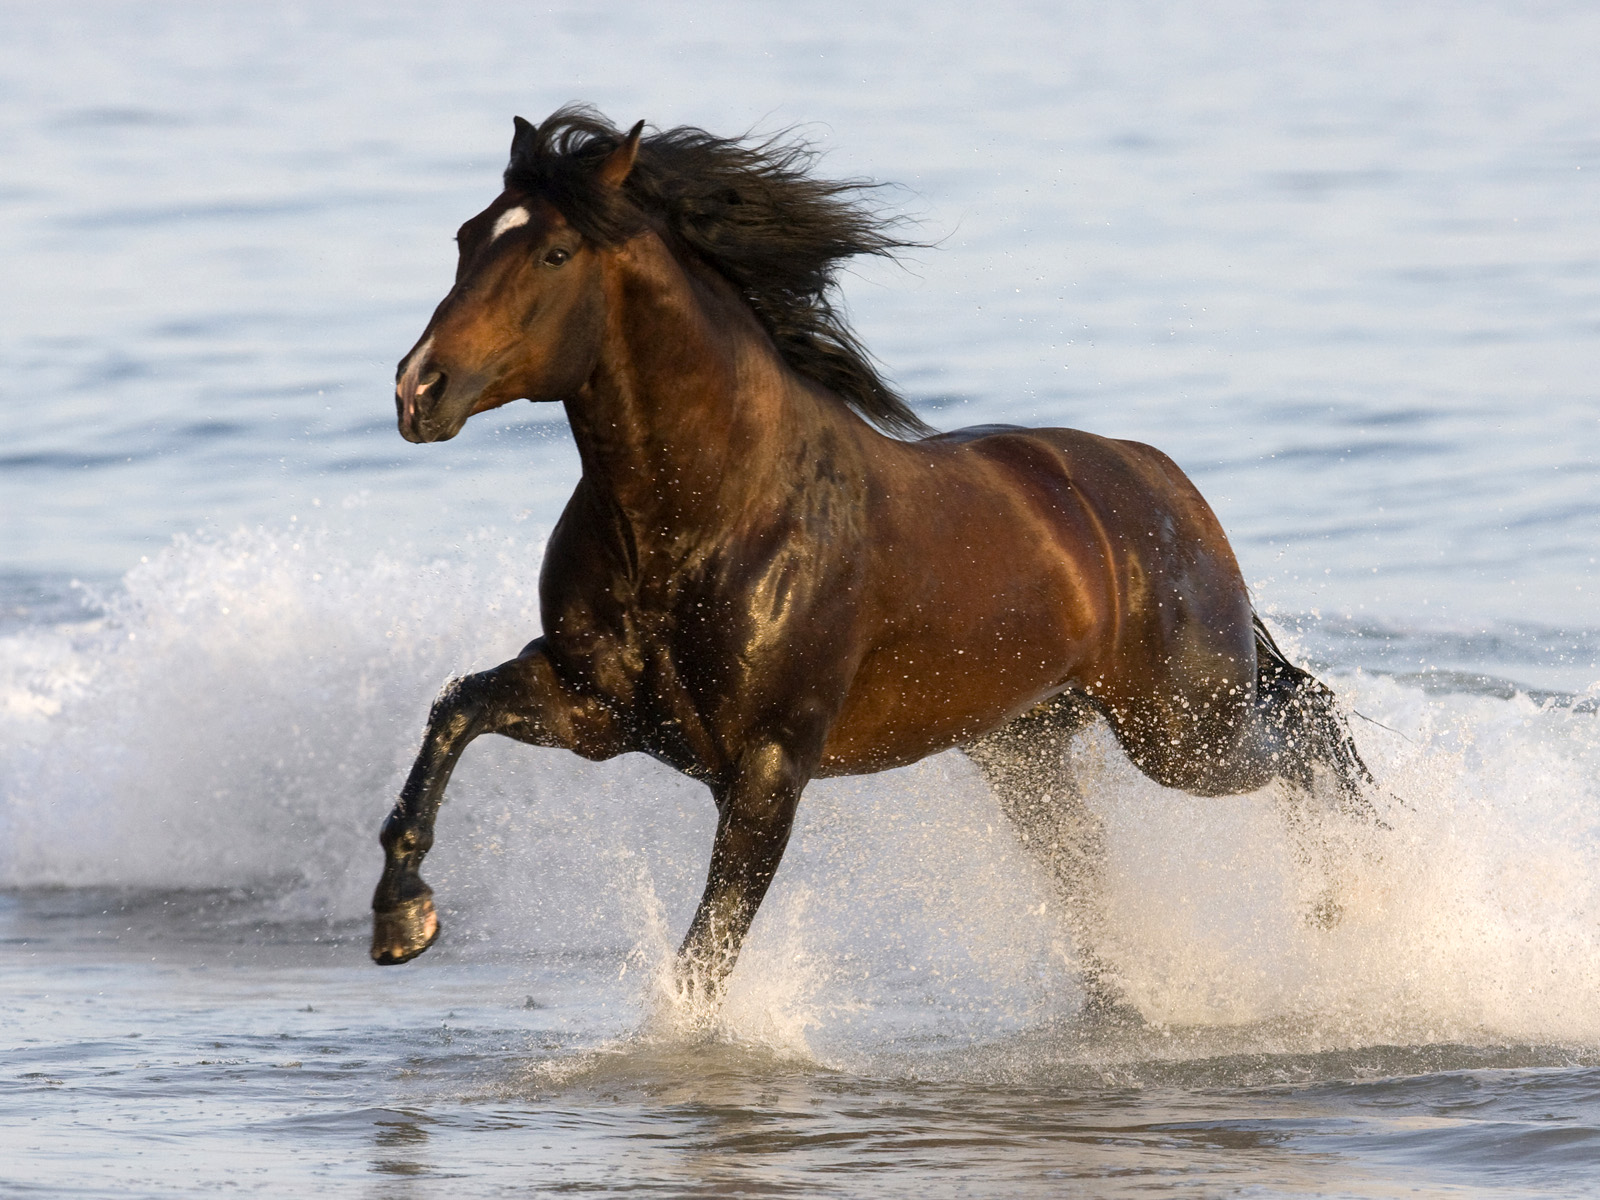 Wallpaper Gallery: Beautiful Horse Wallpaper